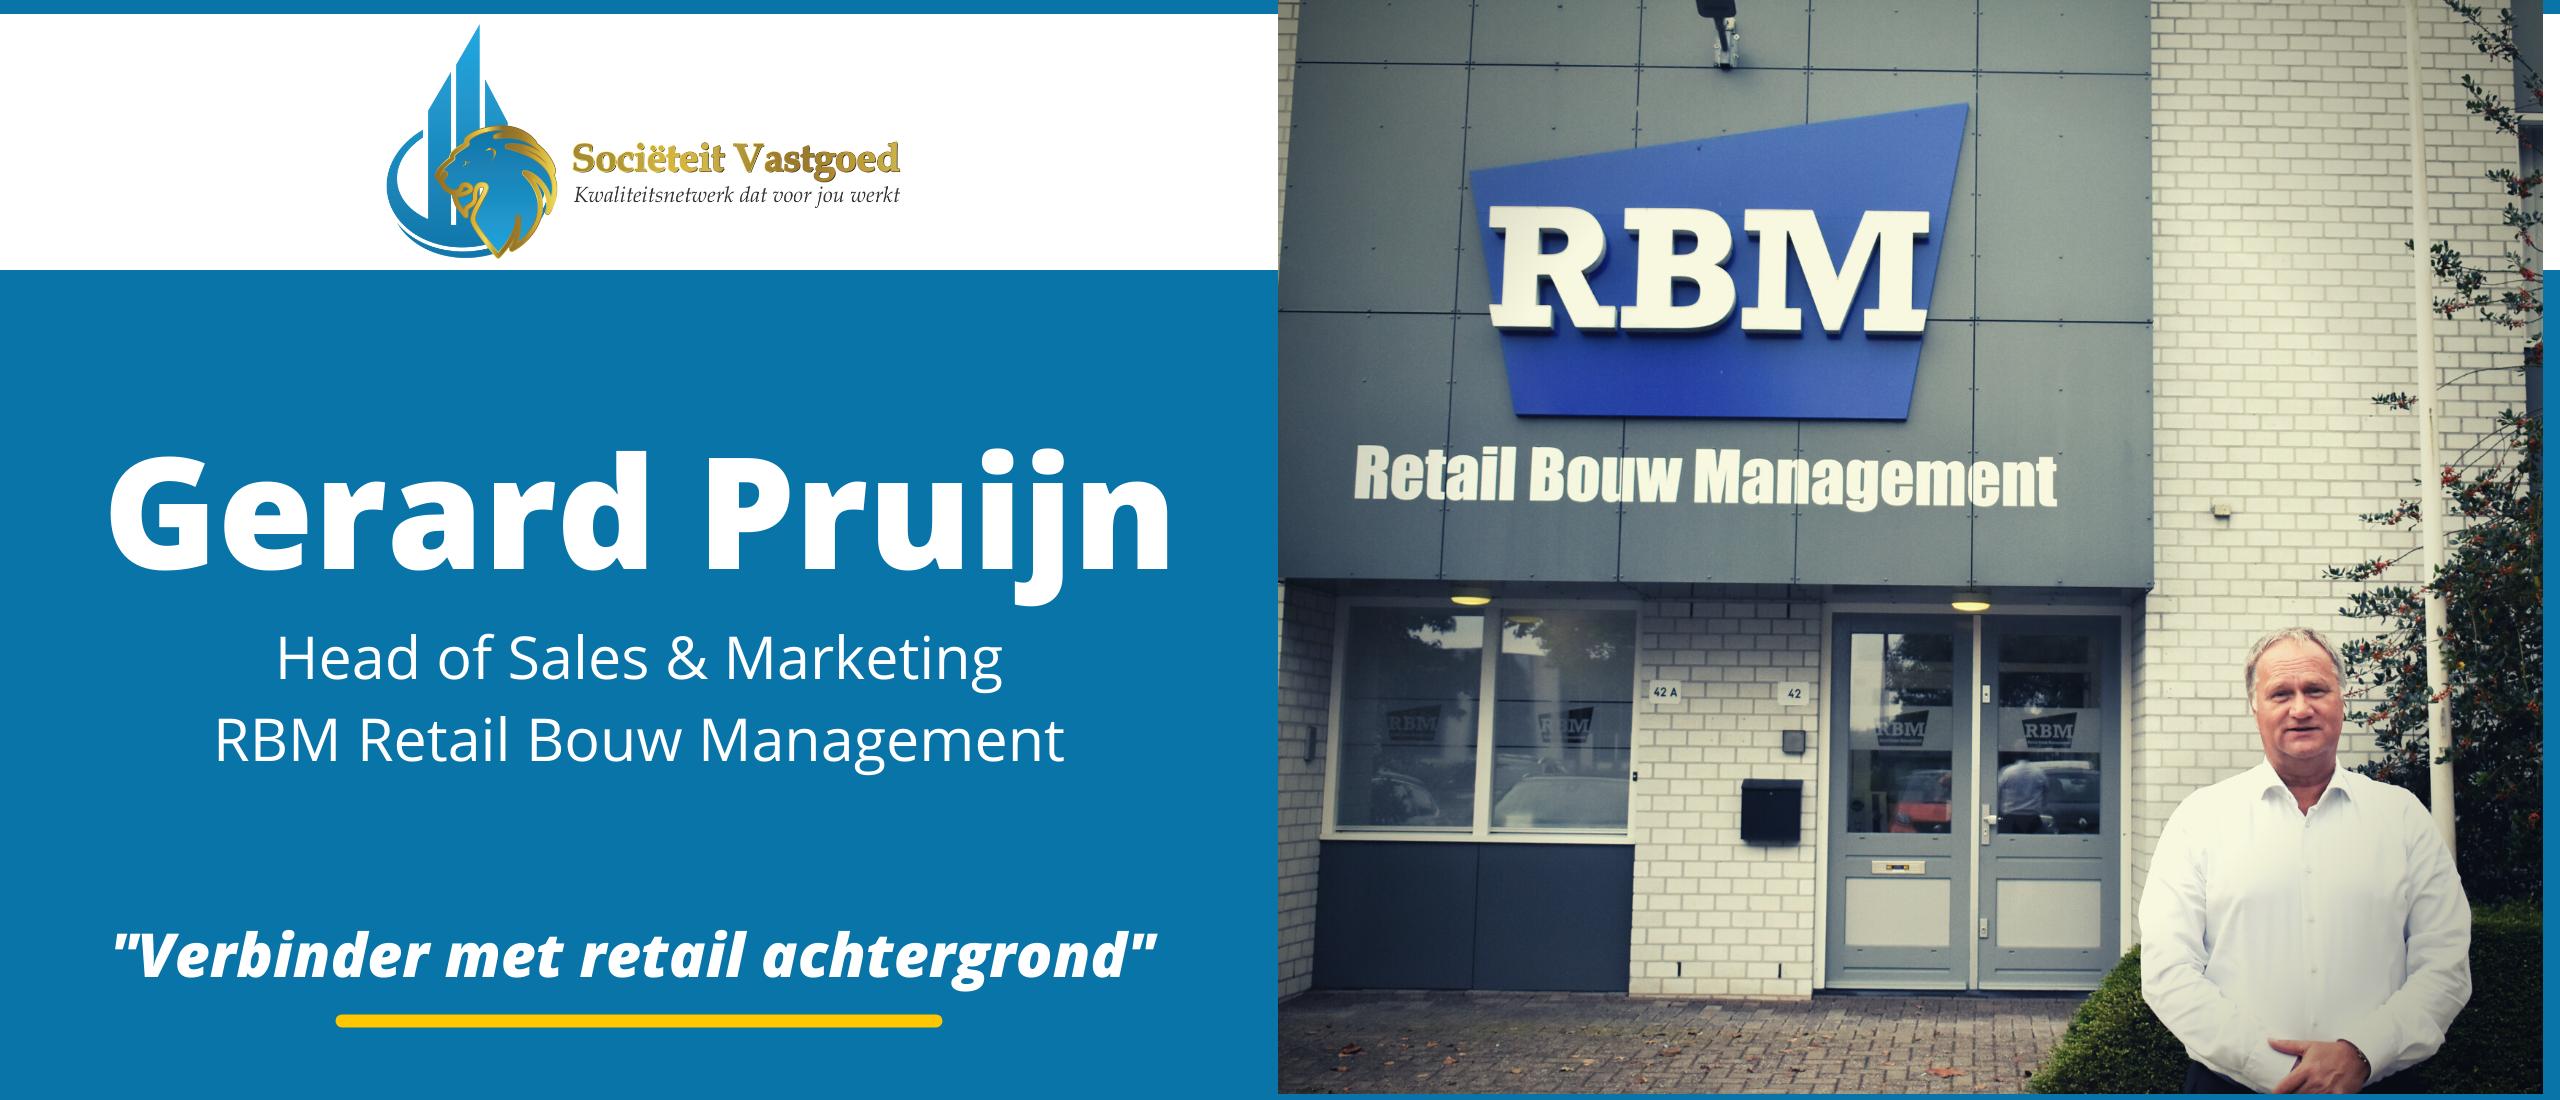 Gerard Pruijn, RBM Retail